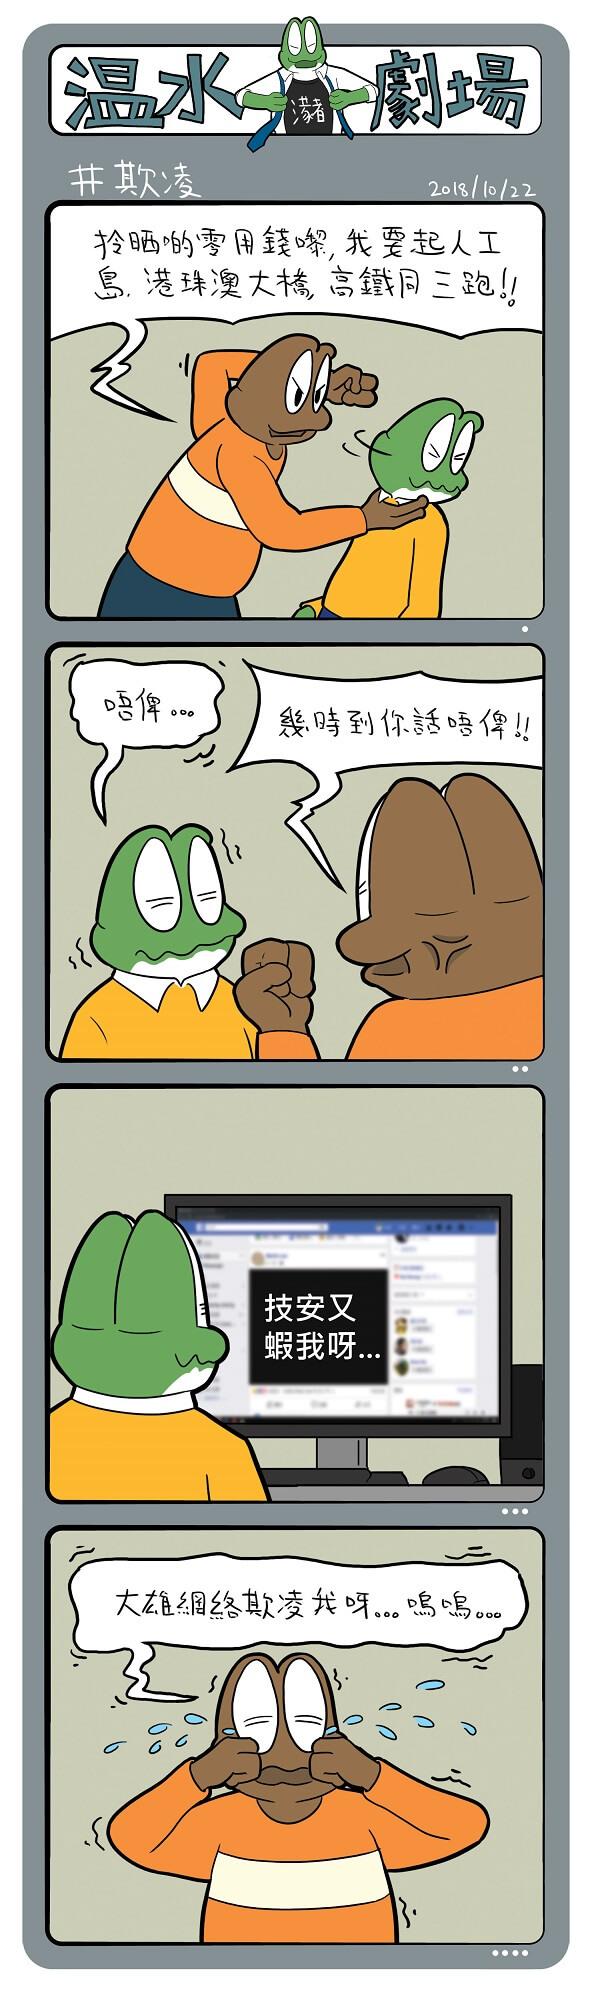 frog_news-lens_174_574